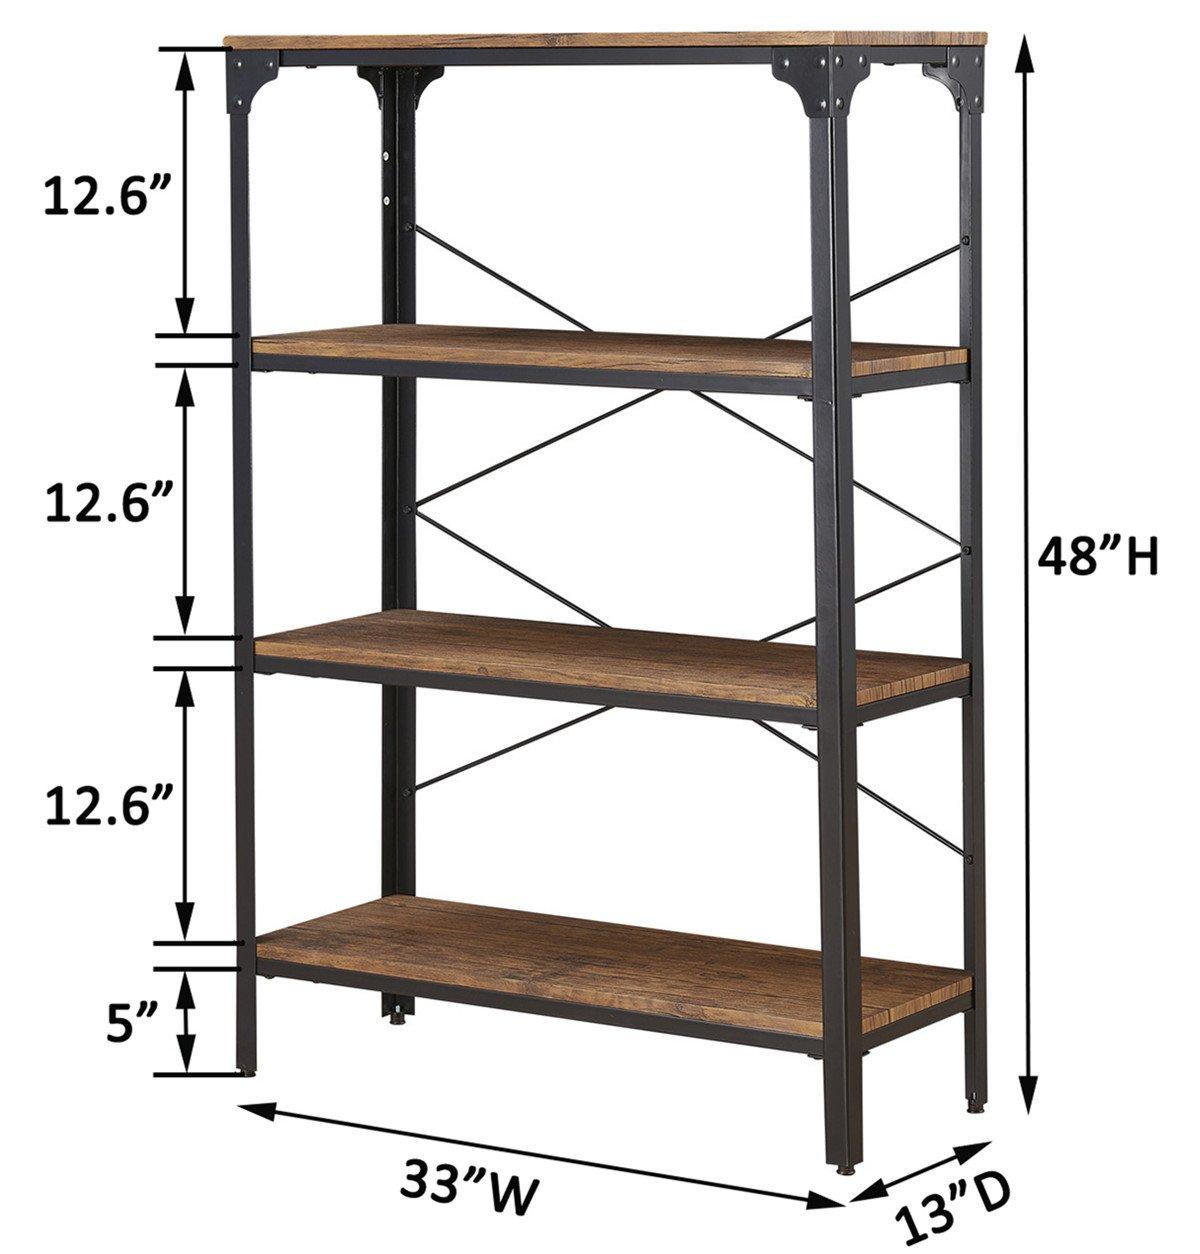 "O&K Furniture 4-Shelf Industrial Vintage Bookcase, Metal Bookshelf, 48""H x 33""W x 13""D, Barn-Wood Finish by O&K Furniture (Image #5)"